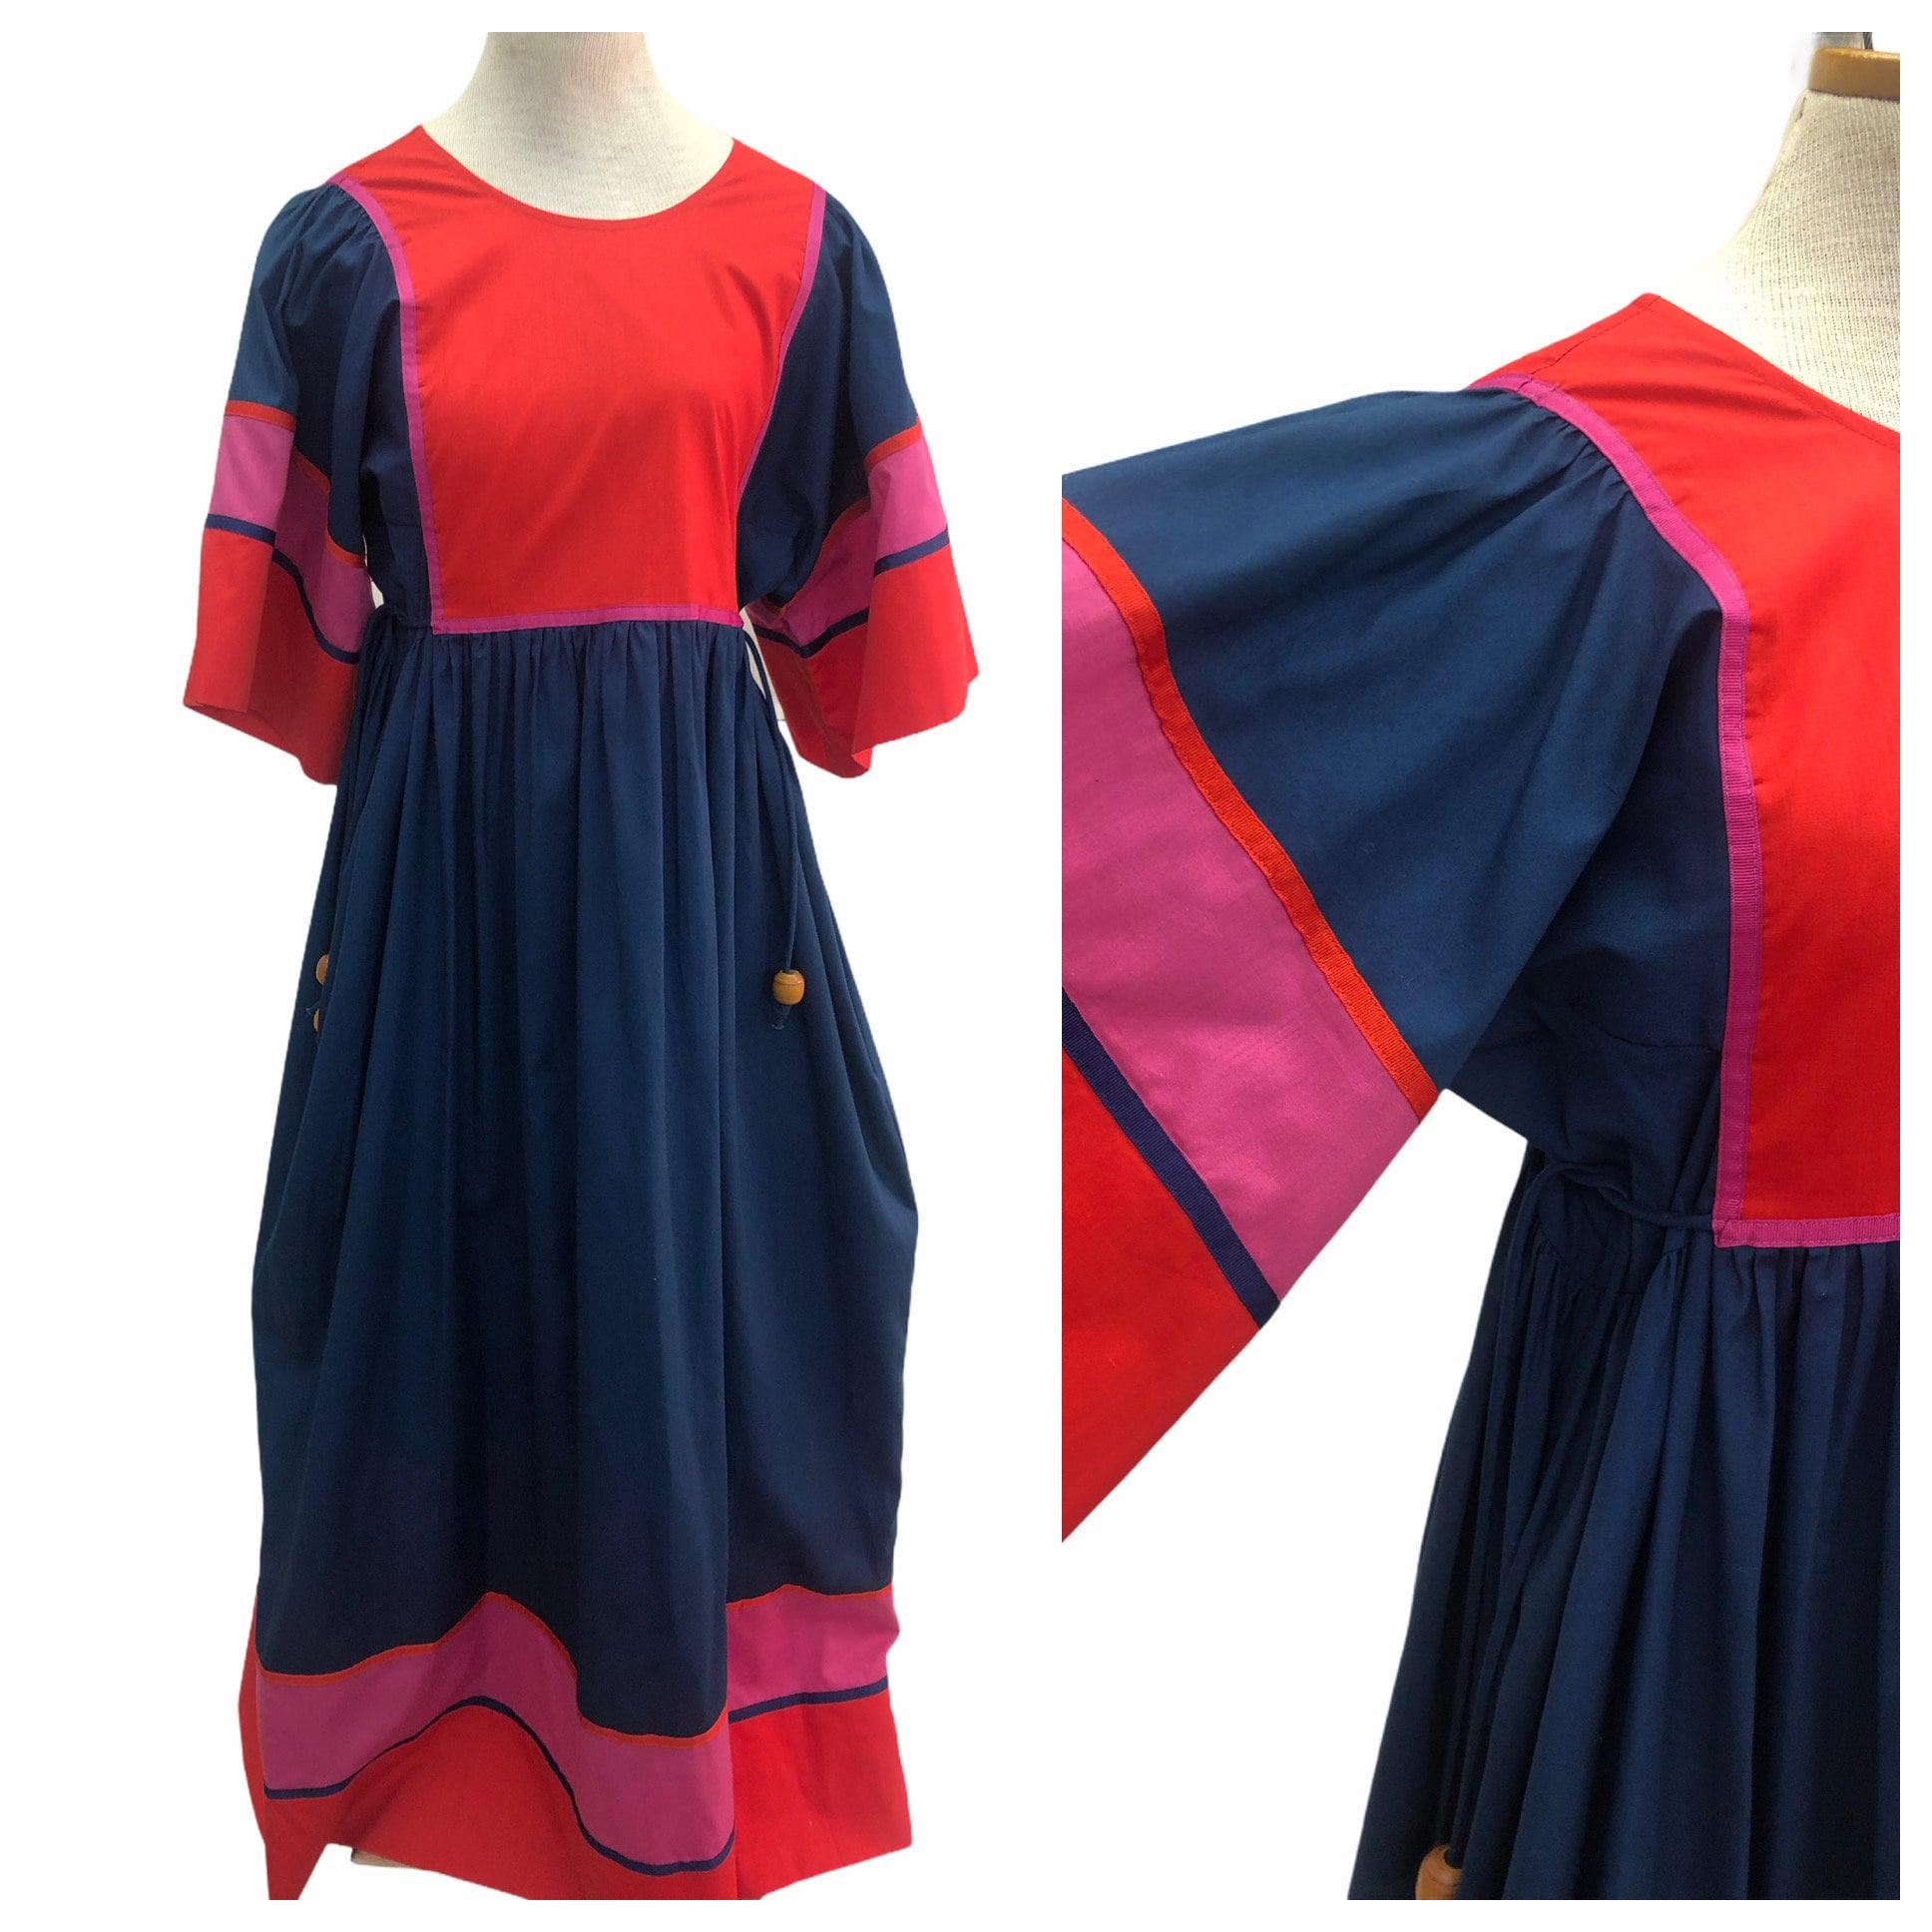 80s Dresses | Casual to Party Dresses Vintage Vtg 1970S 1980S 70S 80S Colorblock Pink Blue Tent Maxi Dress $0.00 AT vintagedancer.com